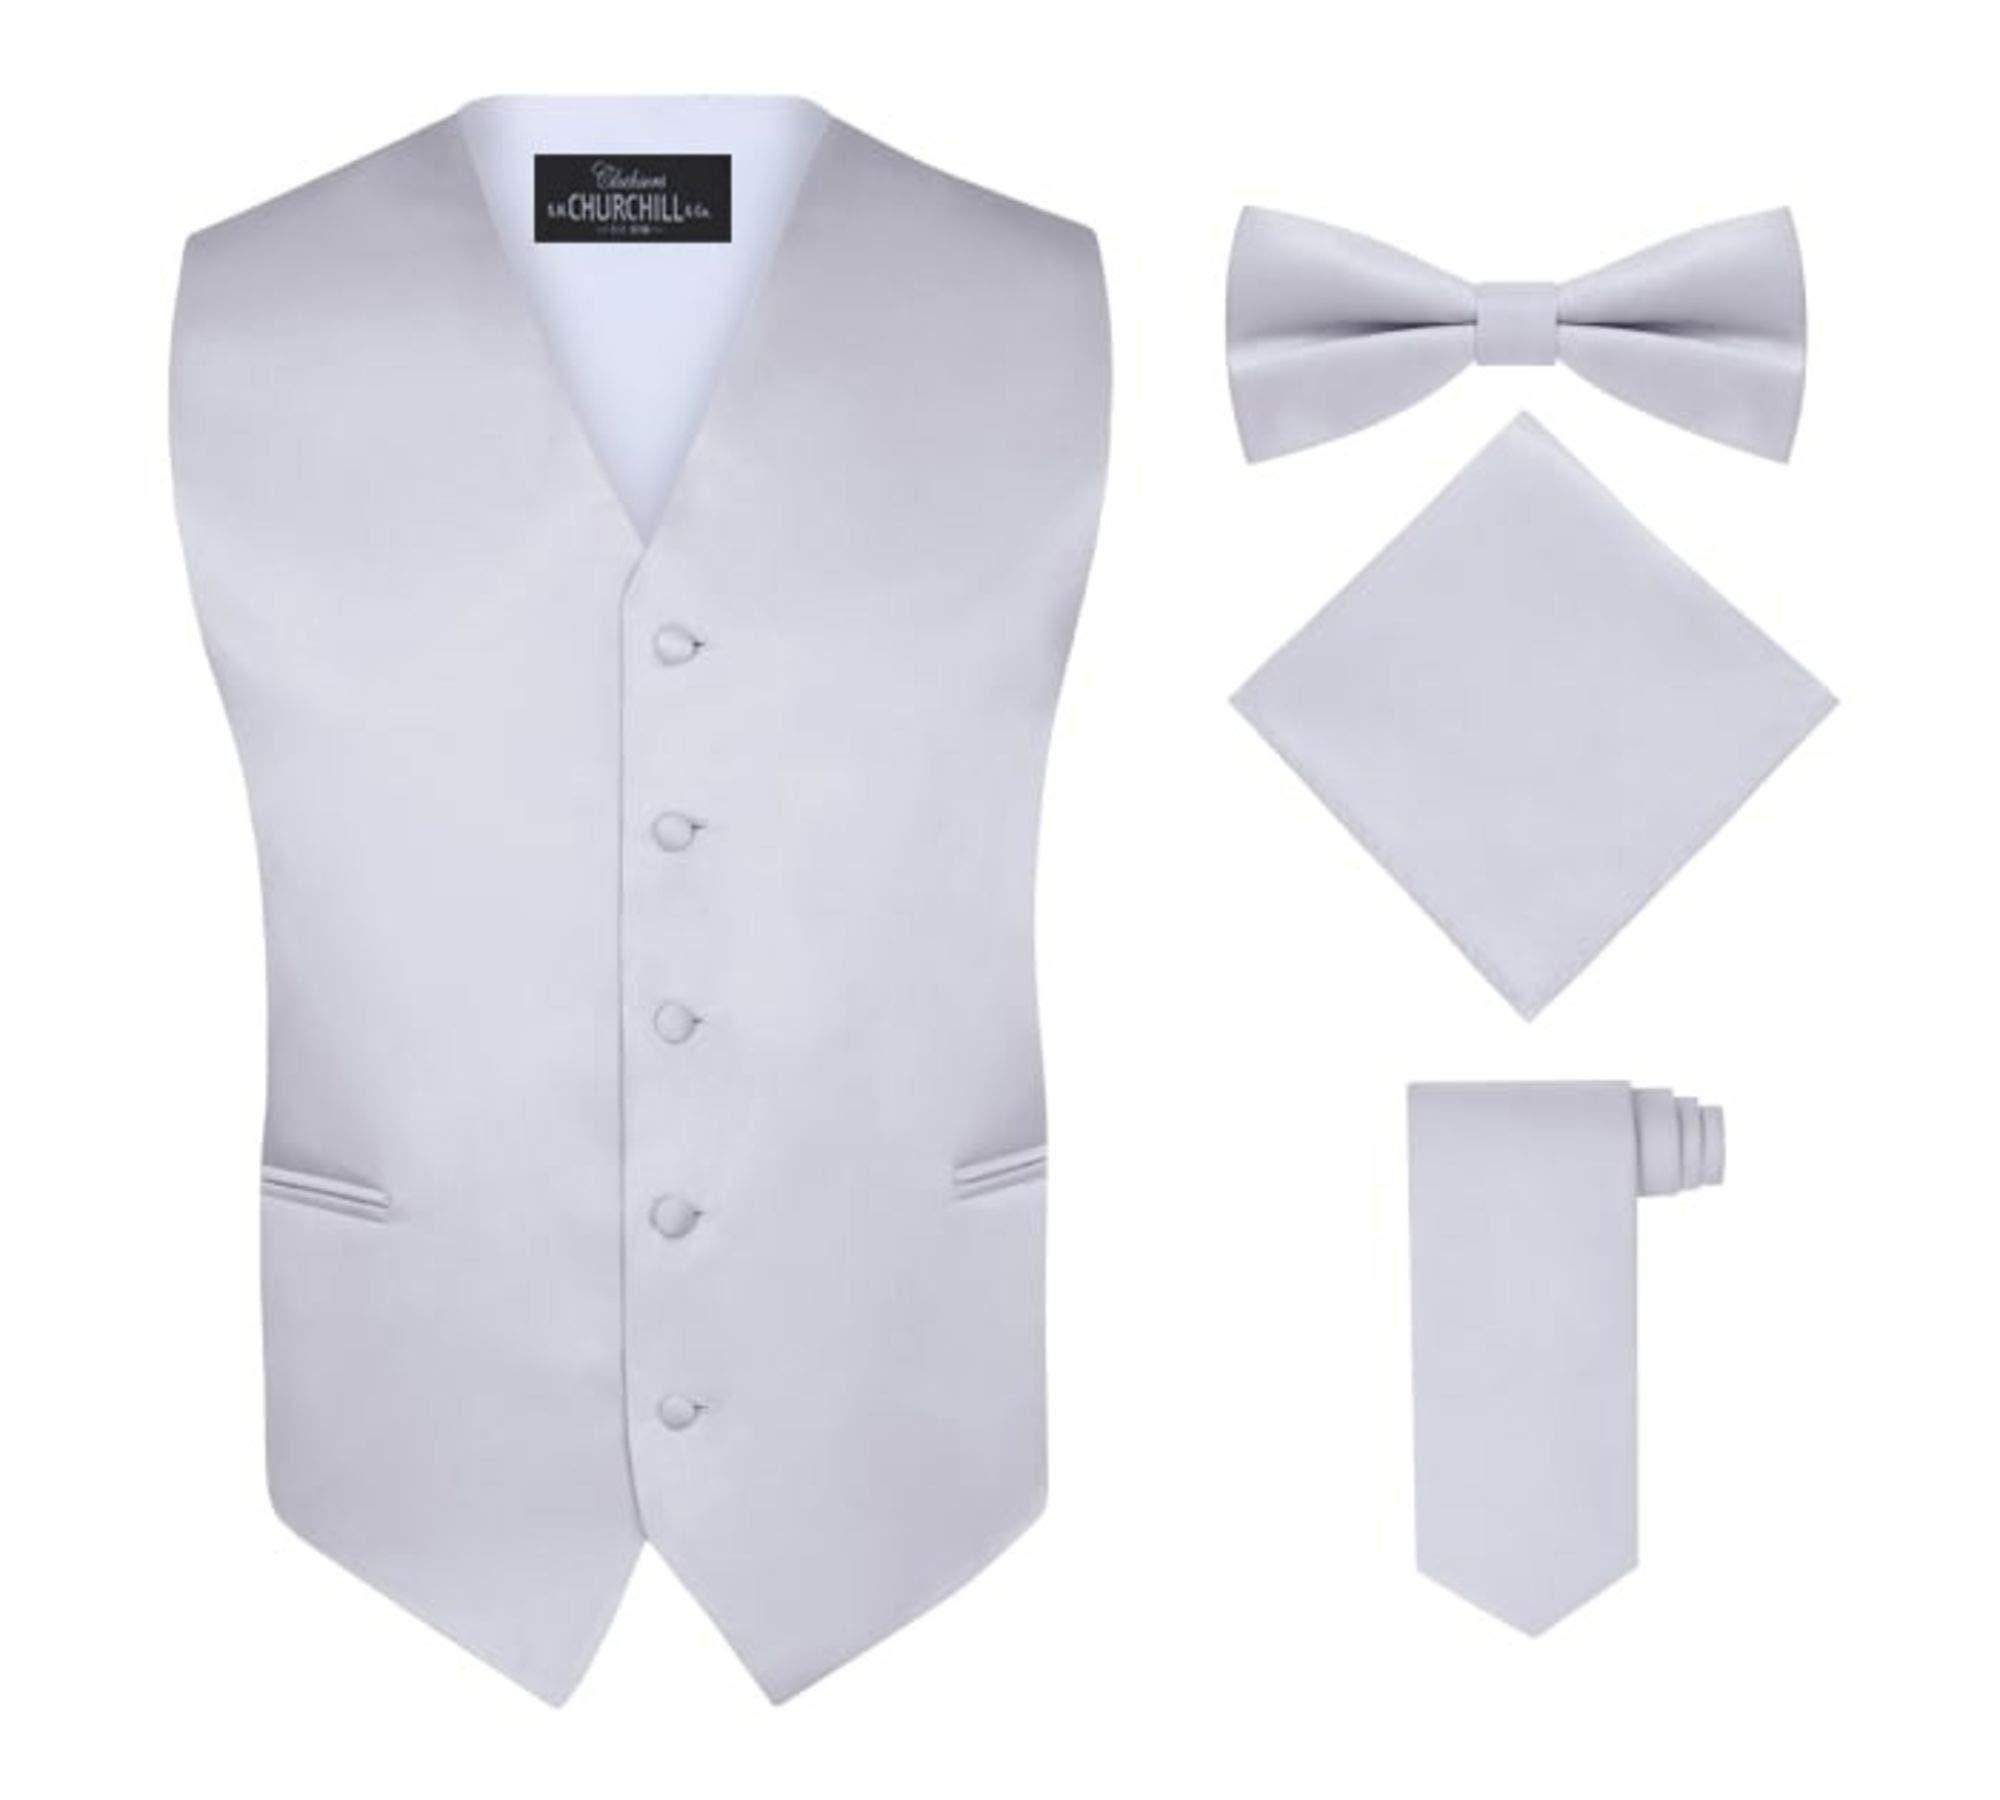 S.H. Churchill & Co. Men's 4 Piece Vest Set, with Bow Tie, Neck Tie & Pocket Hankie - Silver, 3XL by S.H. Churchill & Co.